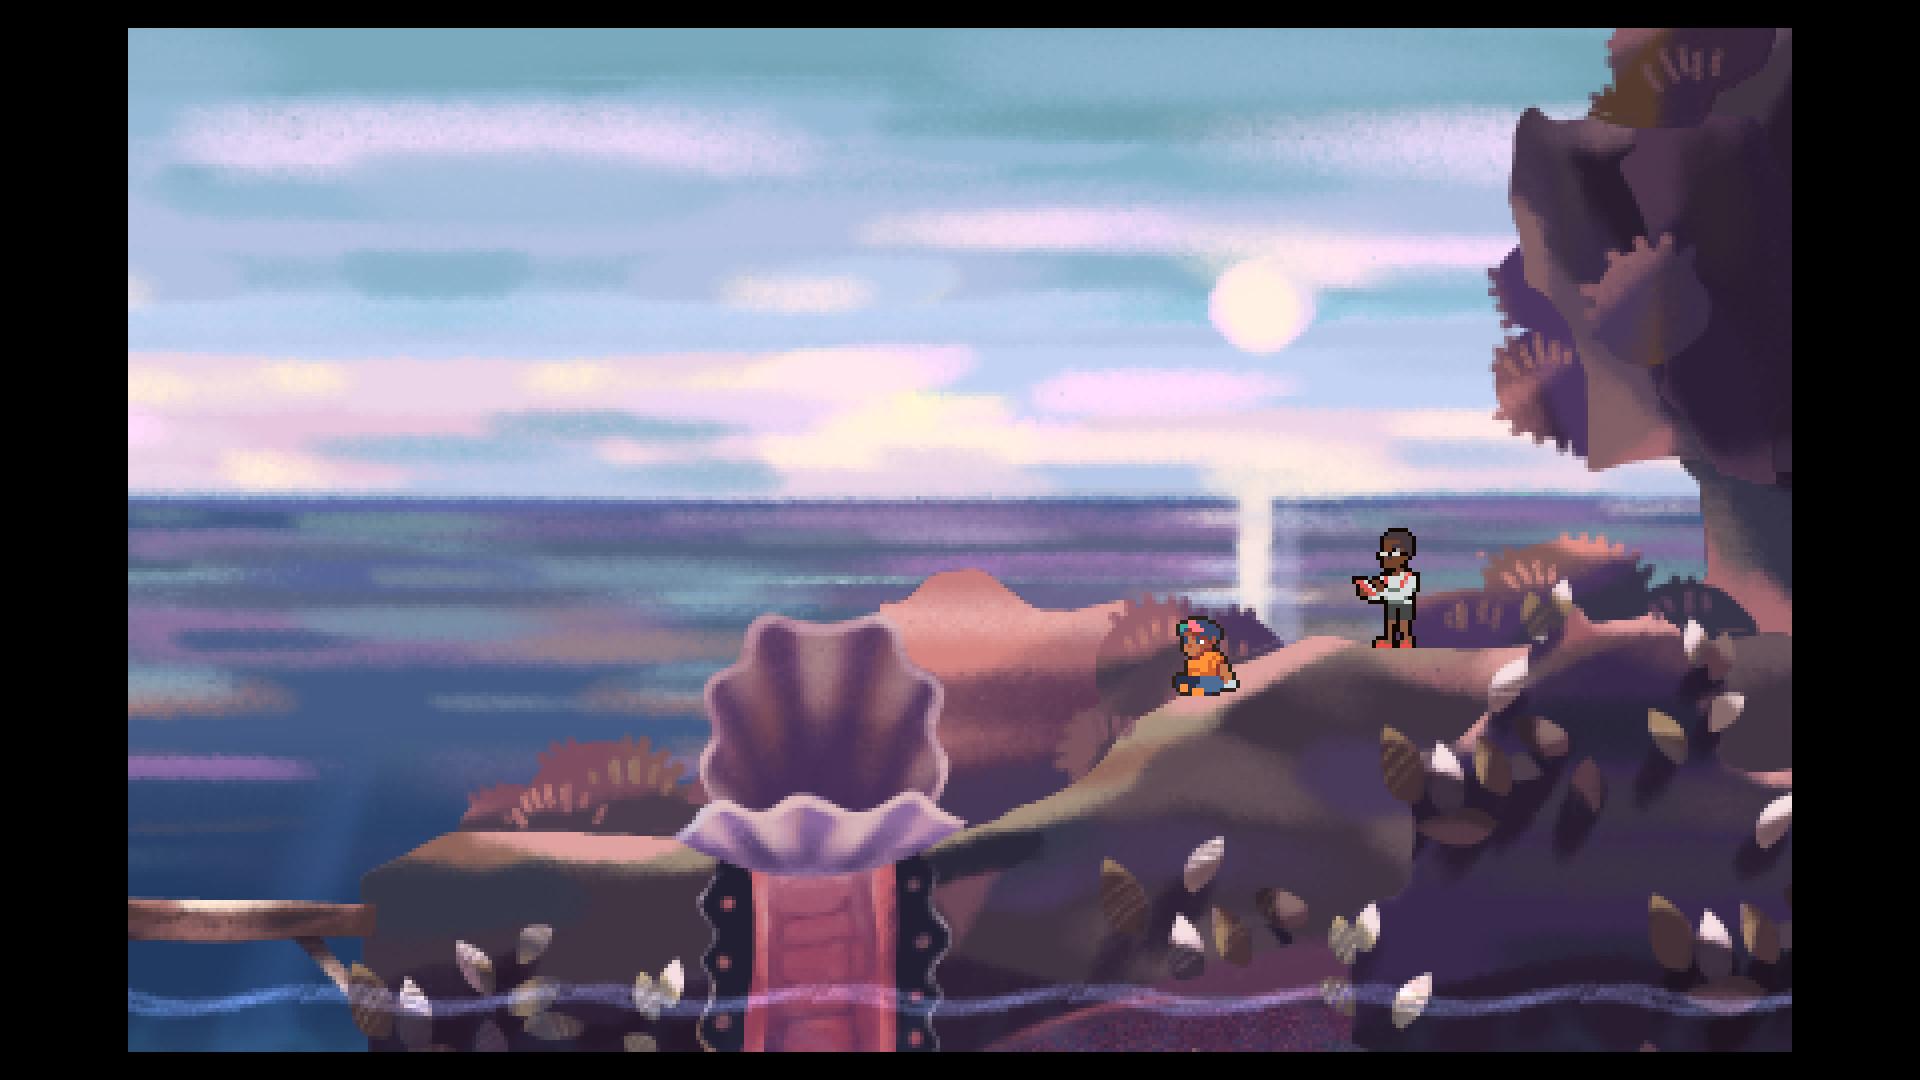 Even the Ocean screenshot